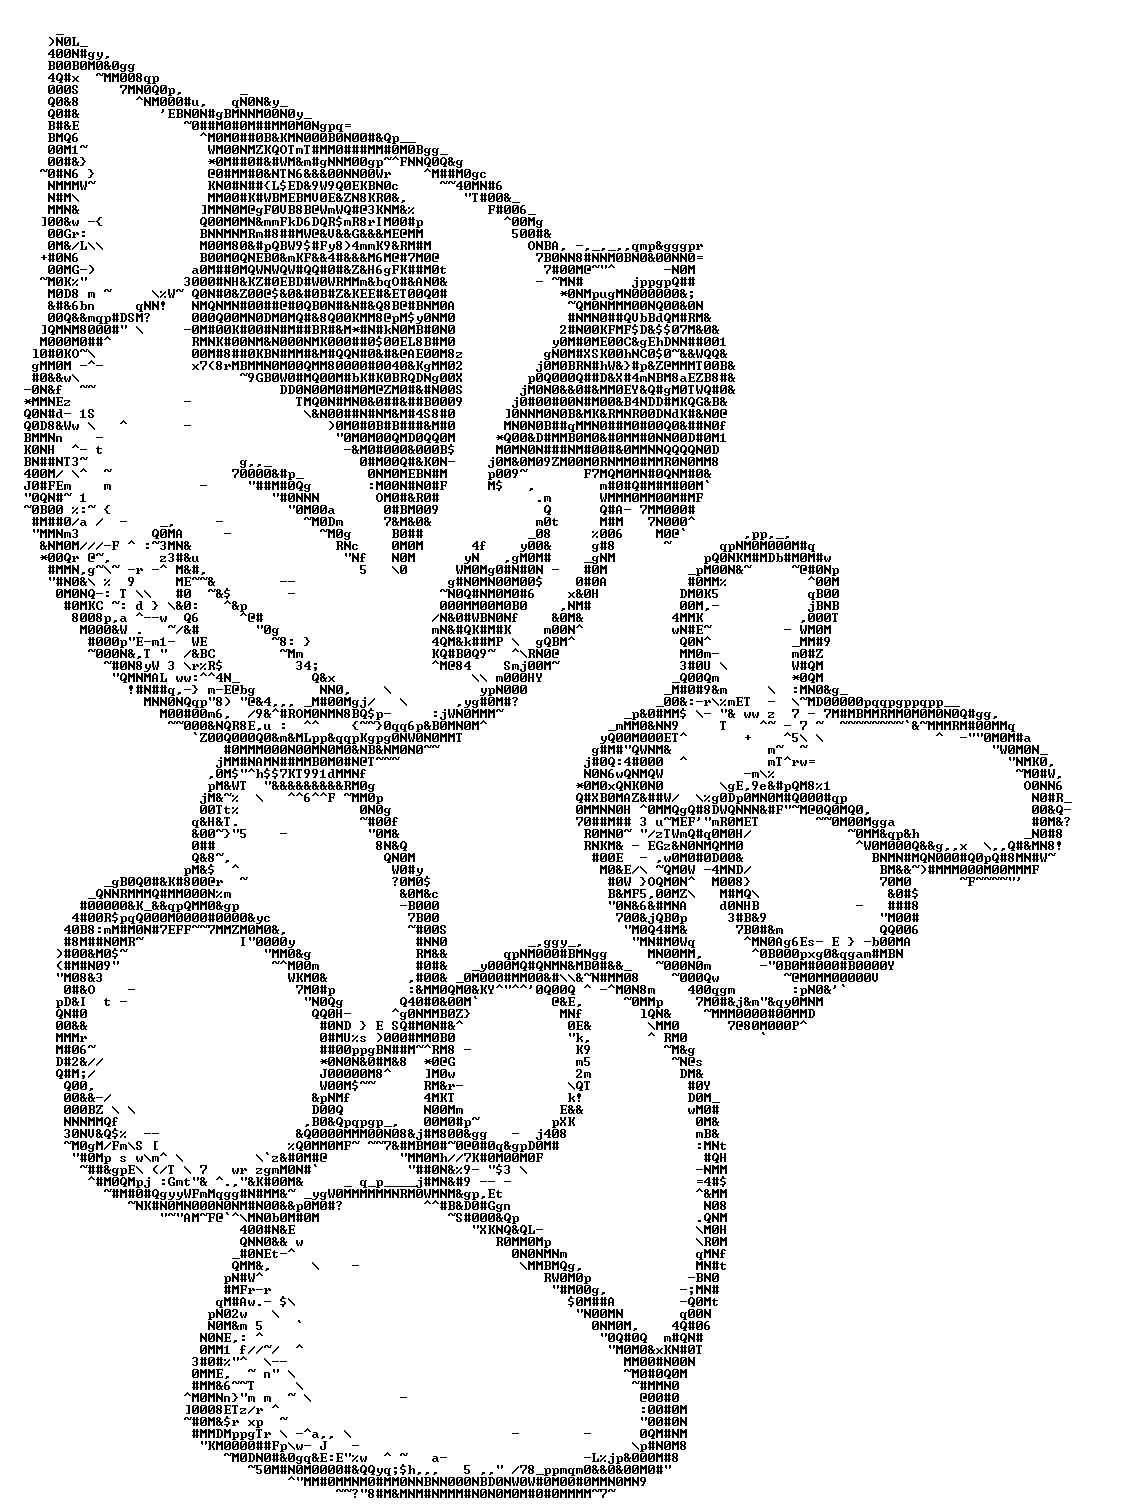 Facebook Ascii Art : facebook, ascii, Wallpapers:, Online, Facebook, ASCII, Generator, Ascii, Generator,